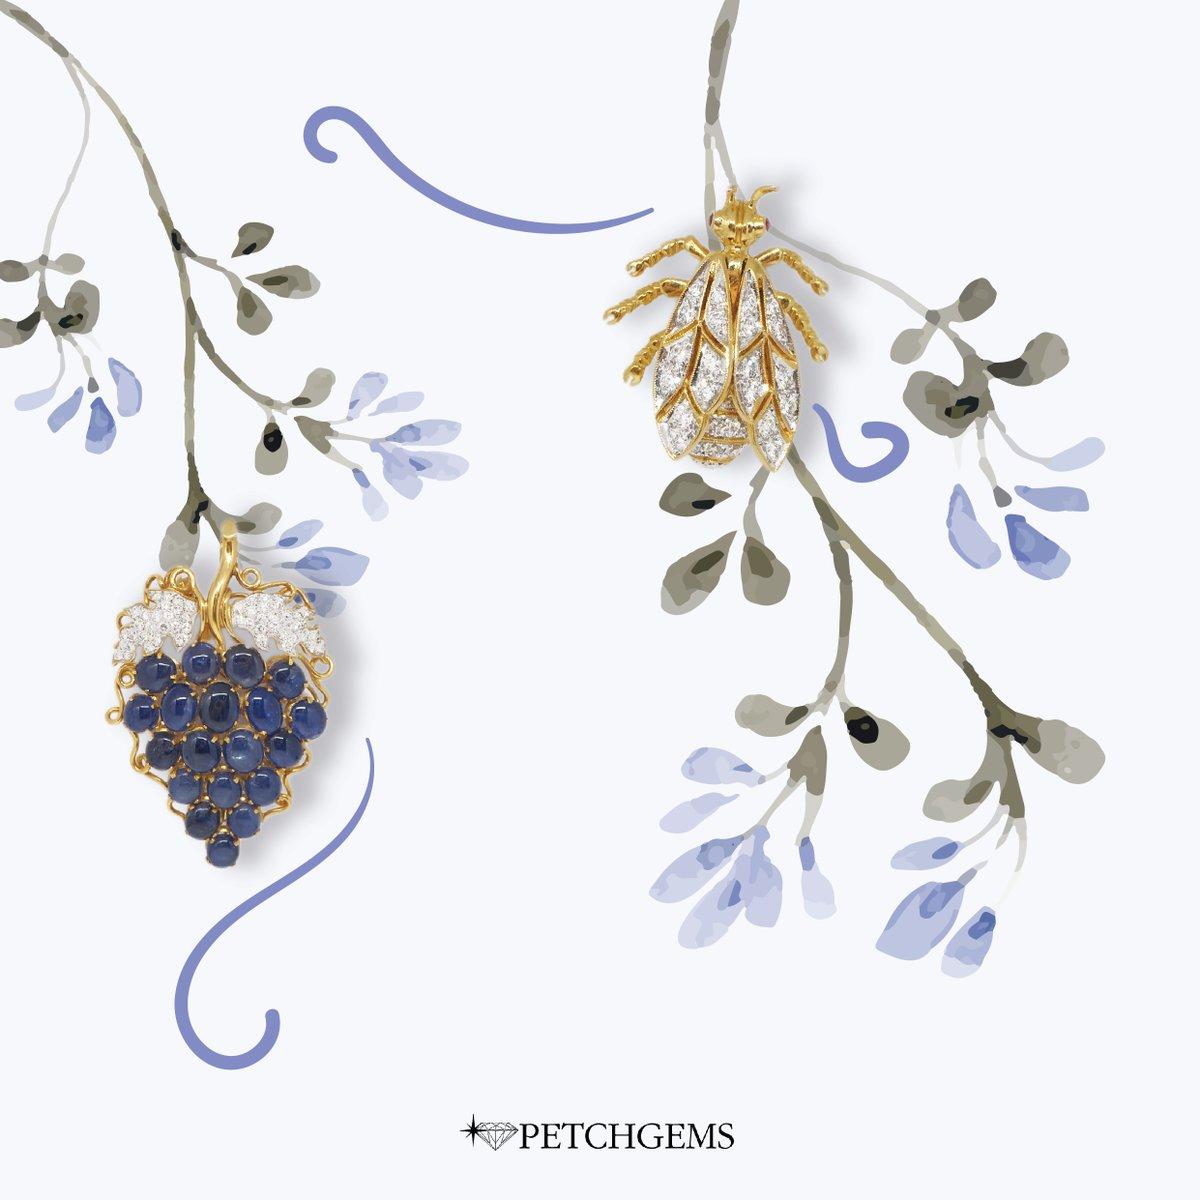 Flower blooming in the winter  #ร้านเพชรเชียงใหม่ #เพชรแท้ #เครื่องประดับเพชร#ร้านเพชร #แหวนเพชร#แหวนหมั้น #แหวนแต่งงาน#แหวนเพชรแท้#jewelry #highjewelry #diamonds #diamondjewelry #highfashion #gemstones#เพชร#weddingband #diamond #diamondring #happyjewelers #Howtoperfect